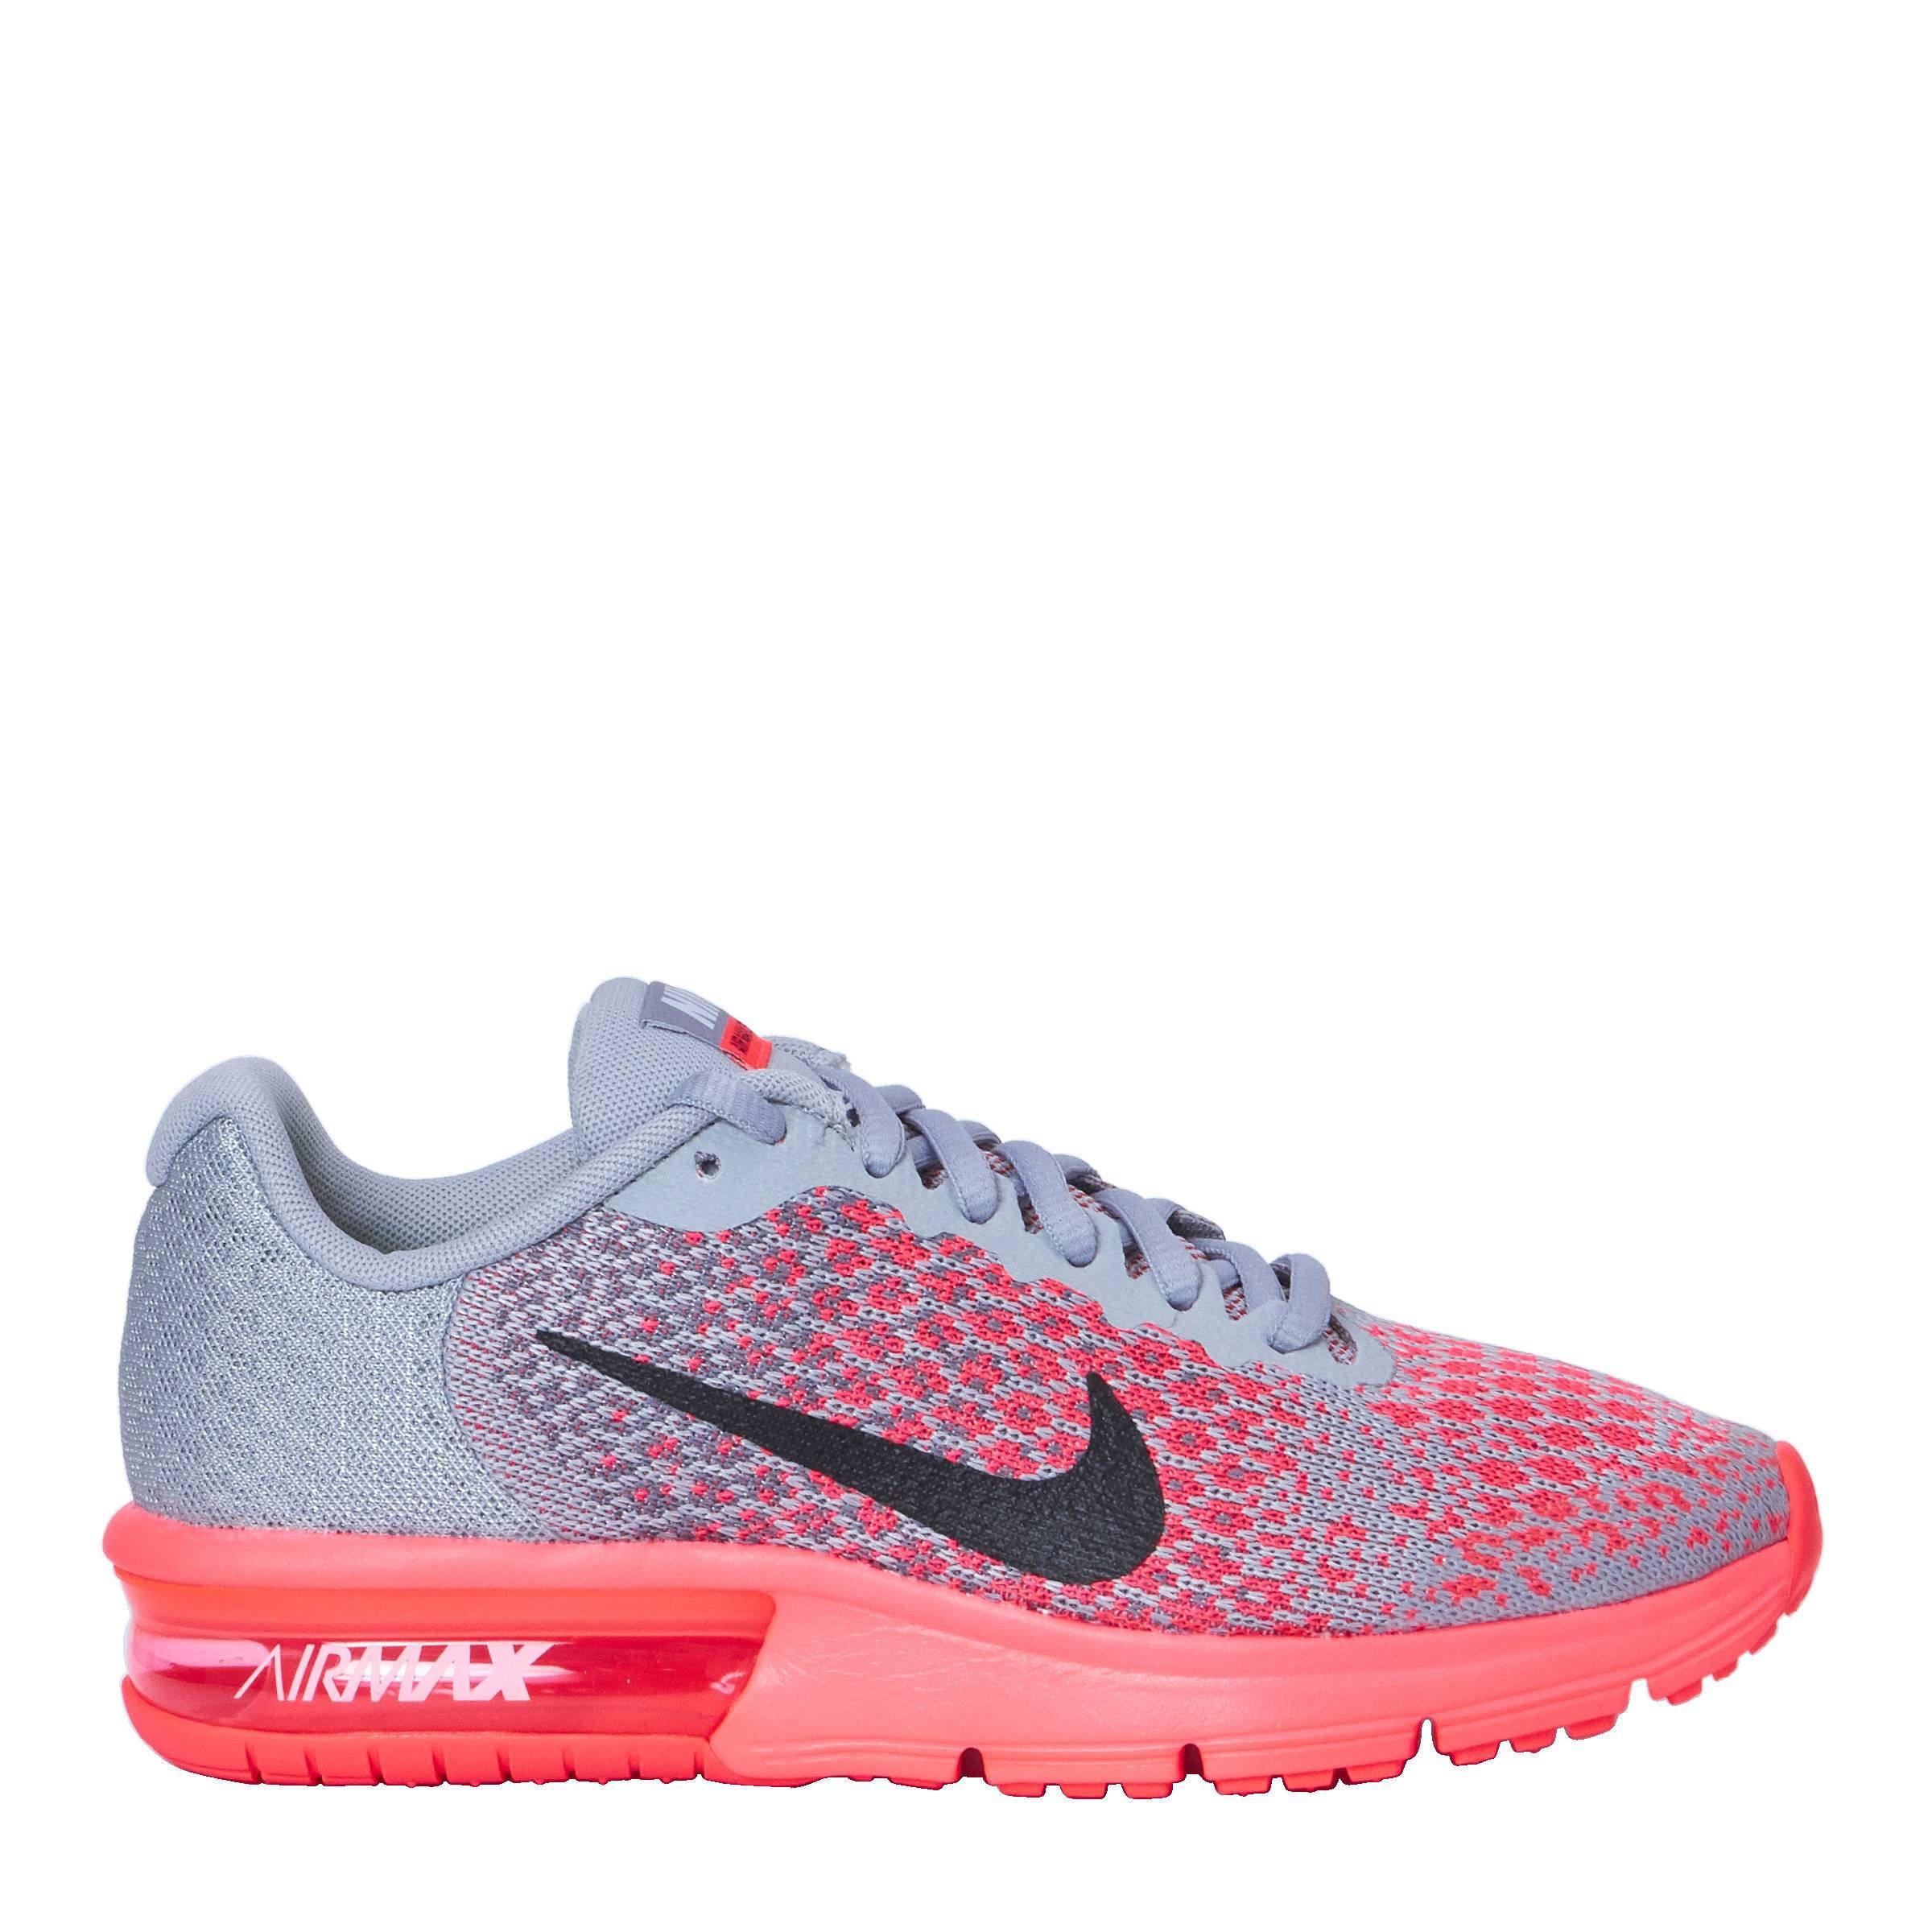 Aanbieding: Nike Air Max Sequent Meisjes Schoenen | Nike met